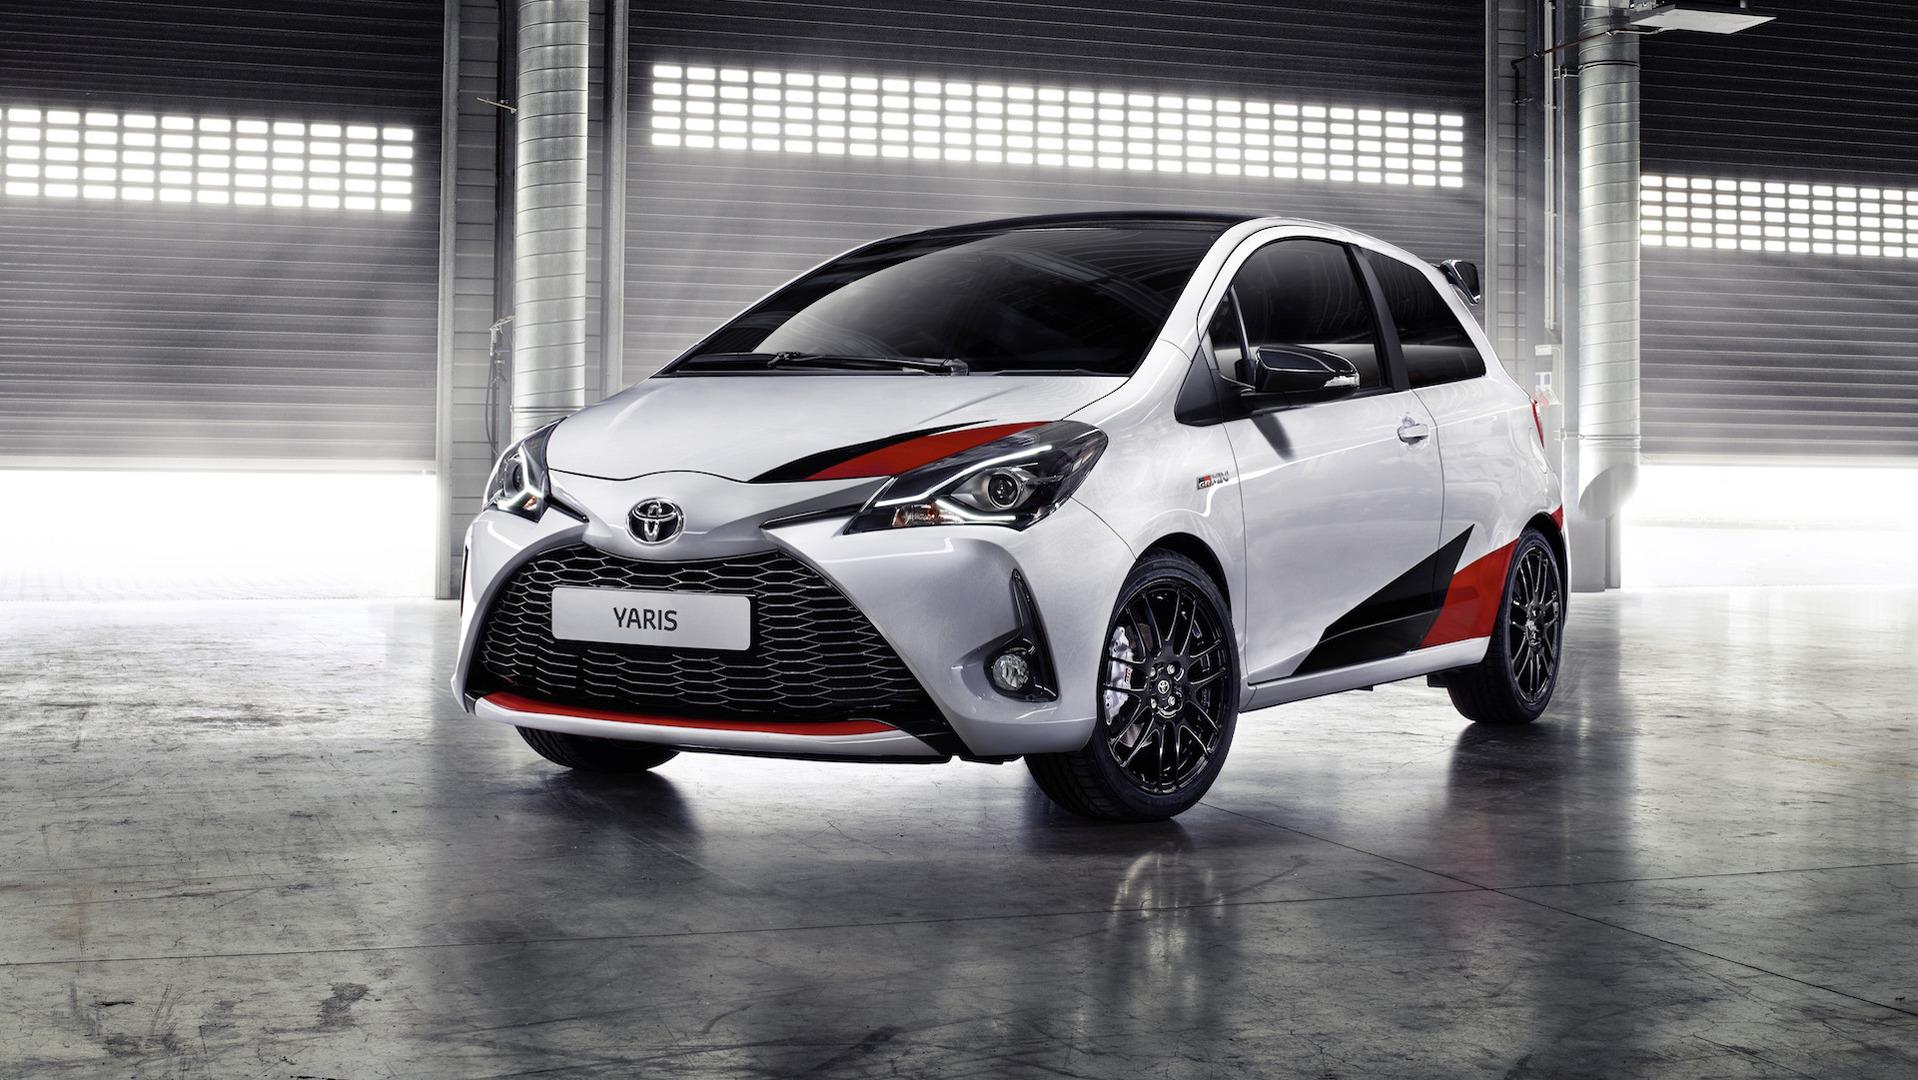 toyota yaris trd limited spek grand new avanza 2016 grmn to 400 units in europe